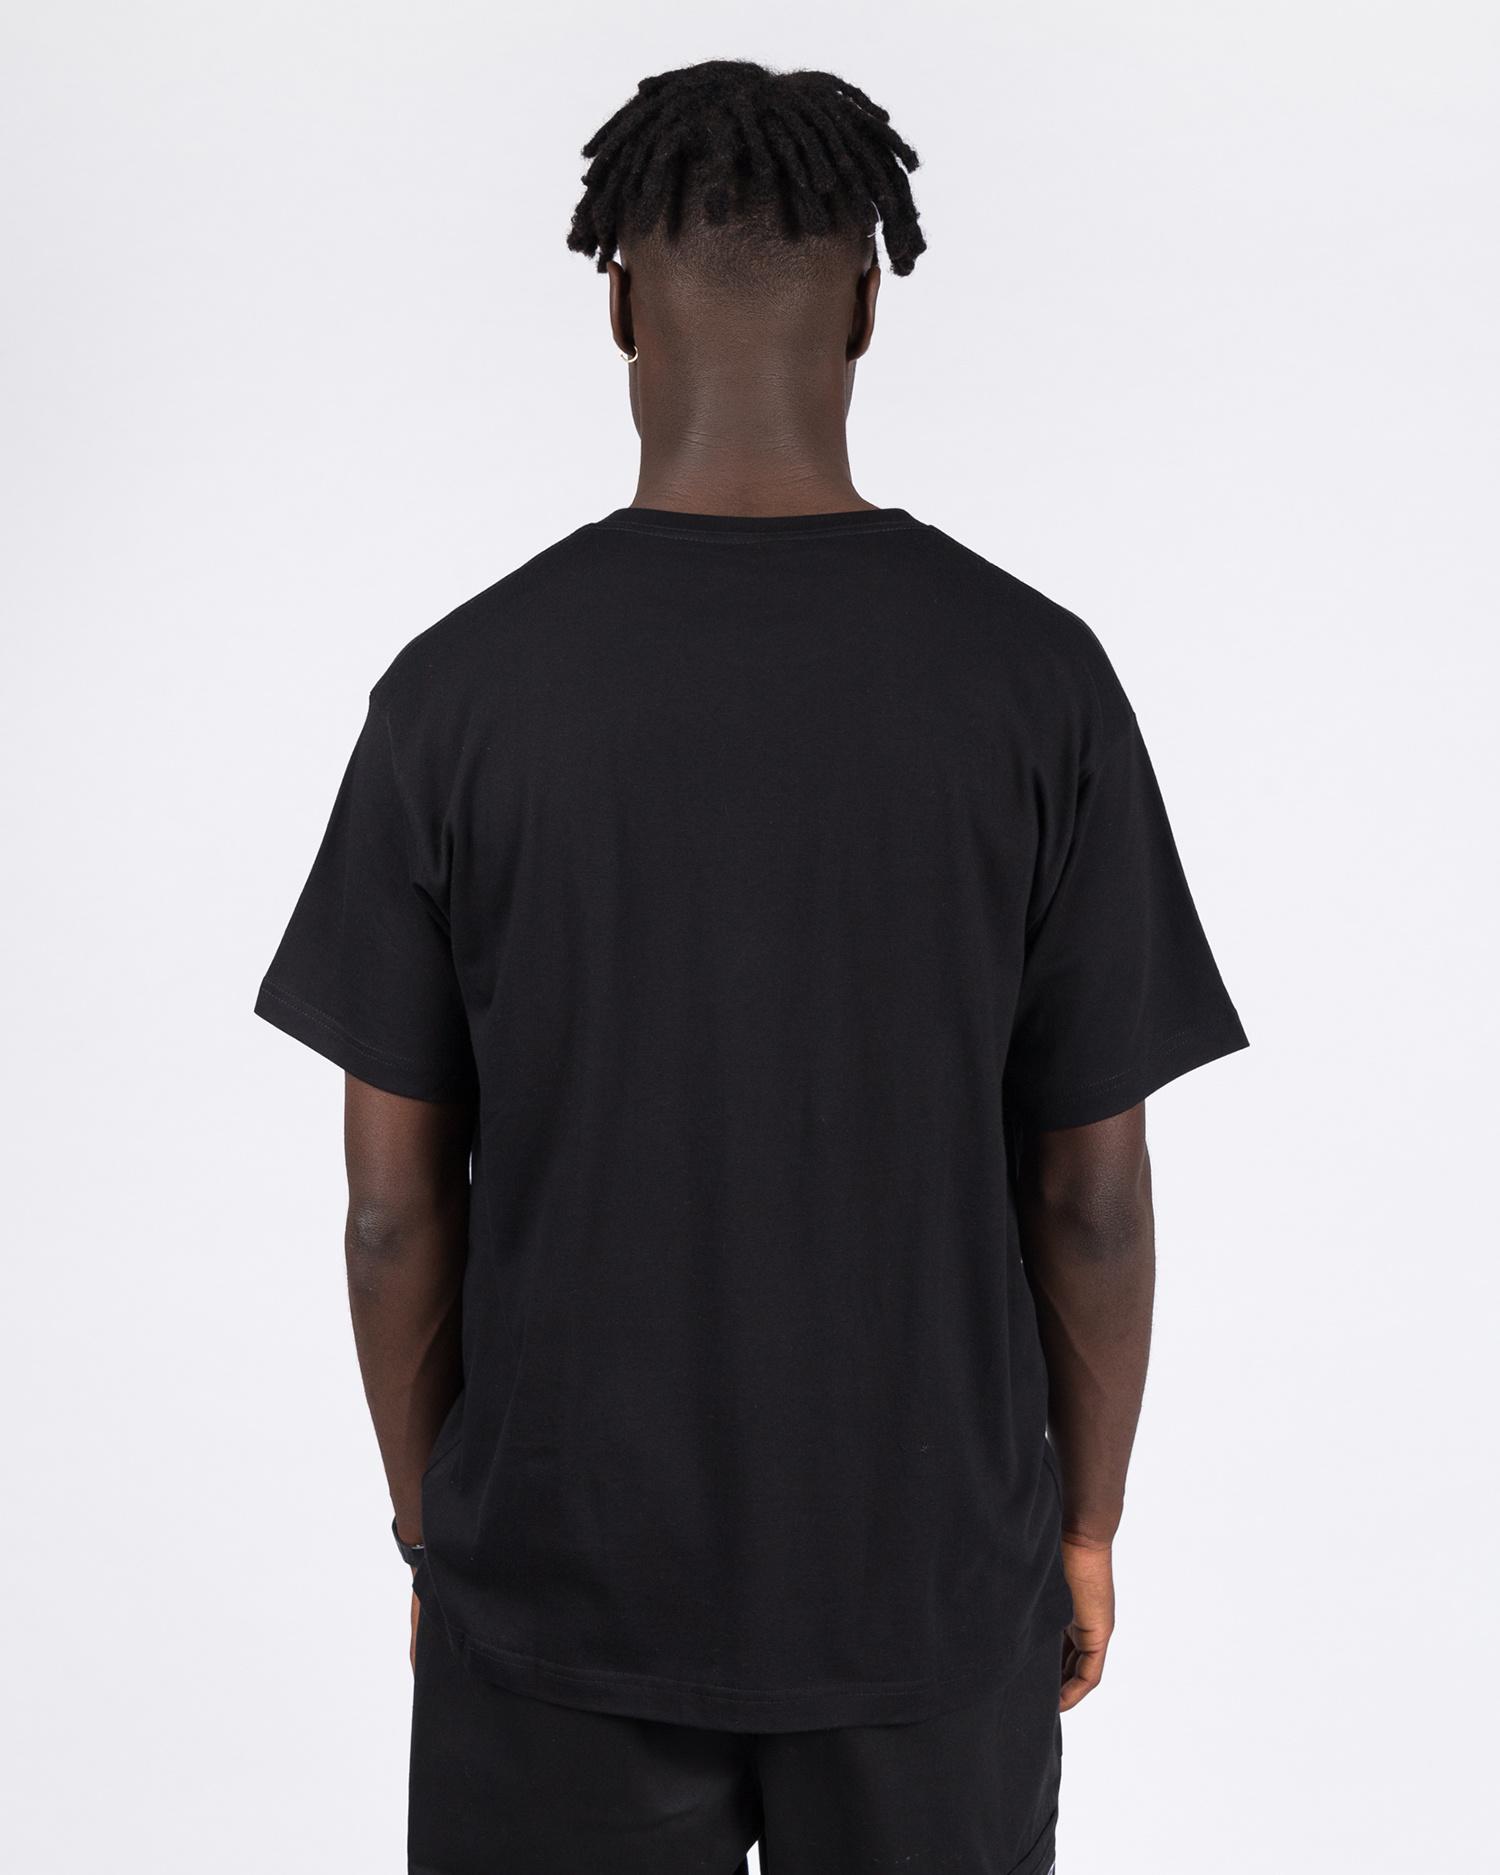 Patta Square Ring T-Shirt Black